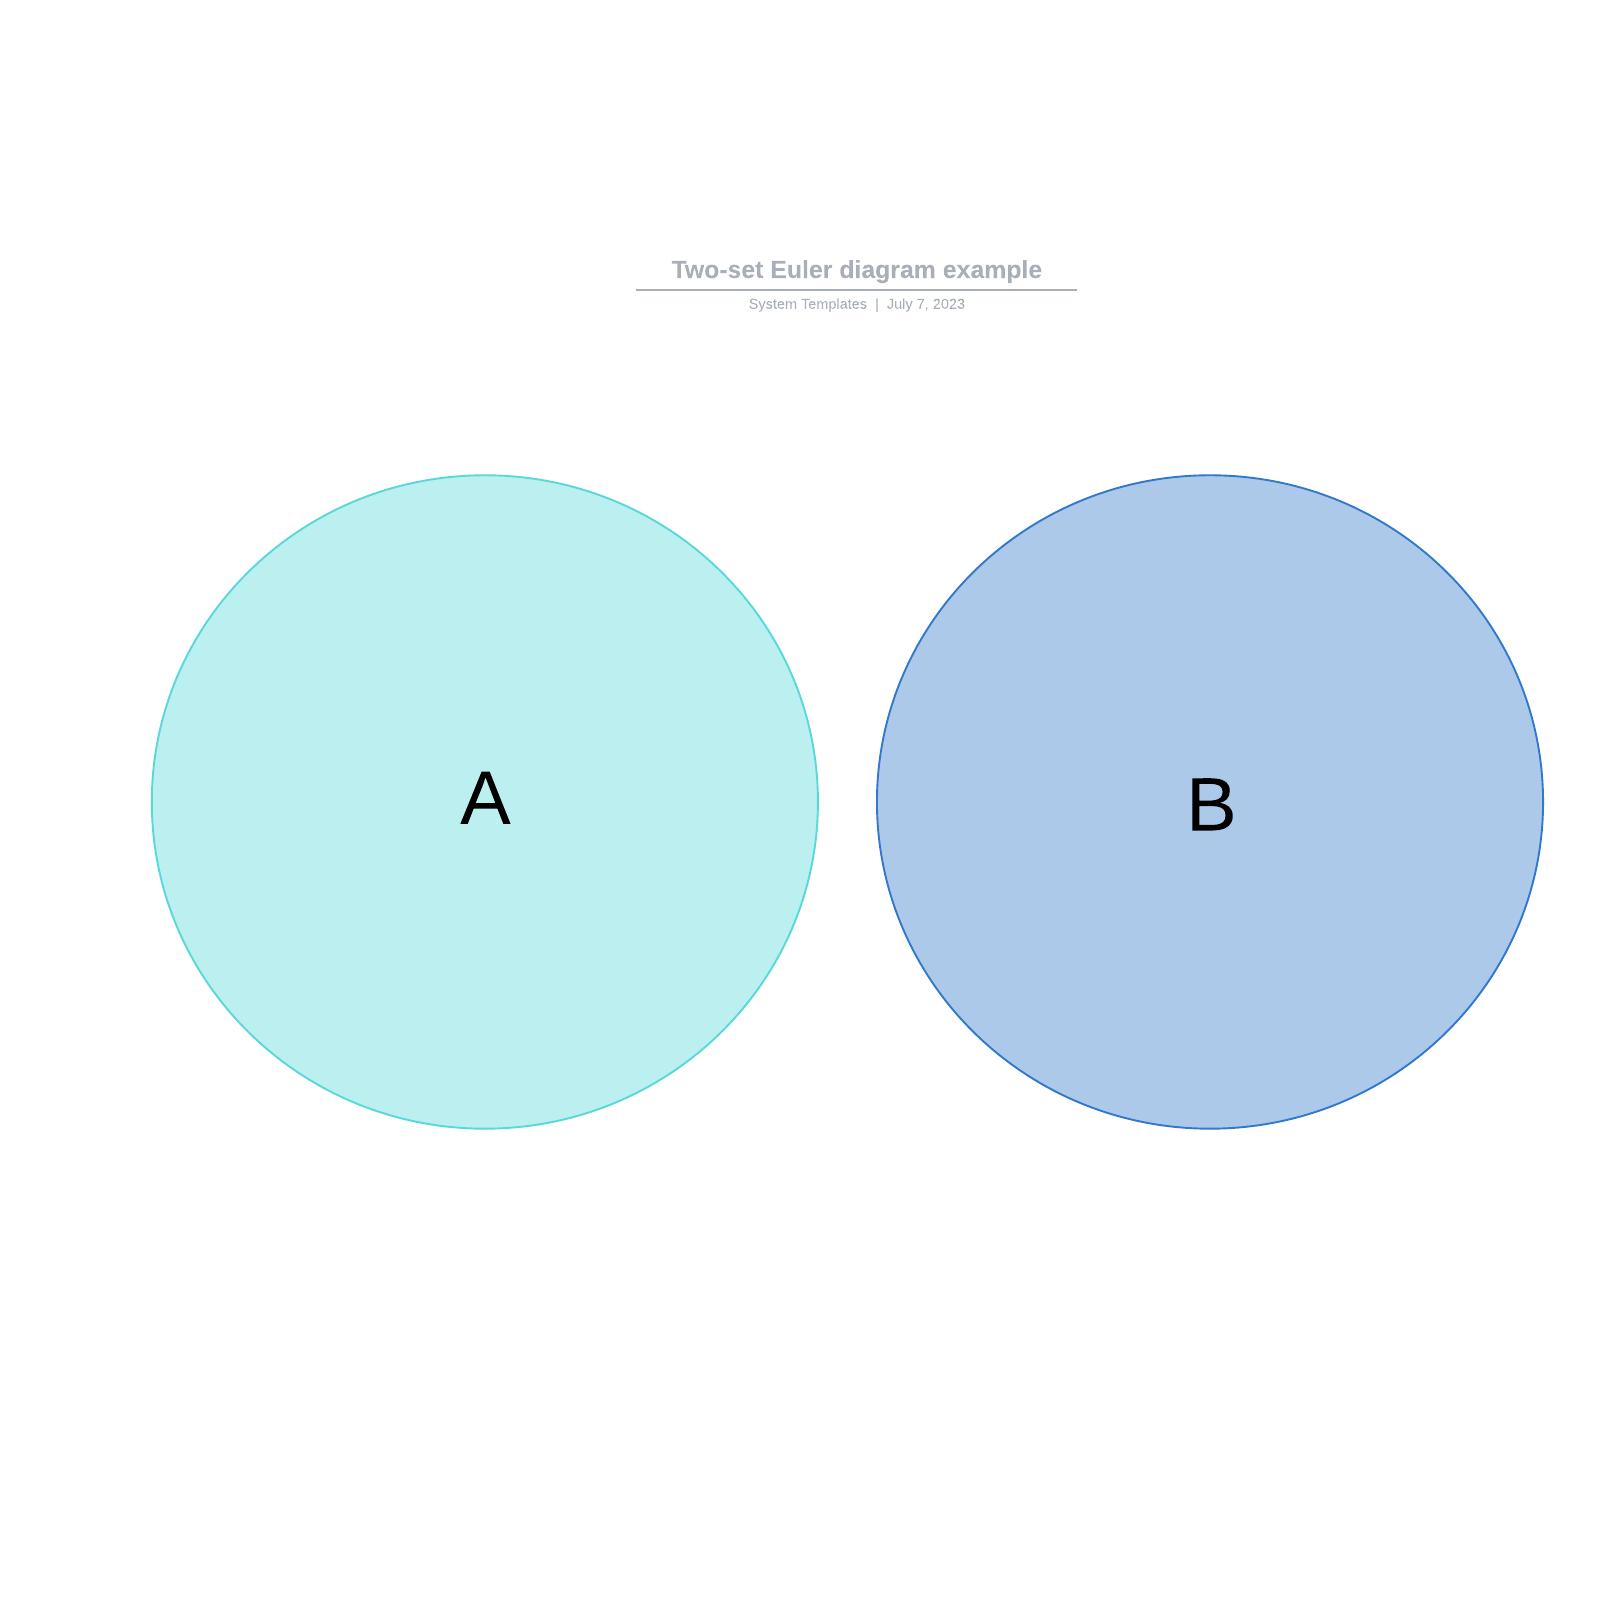 Two-set Euler diagram example